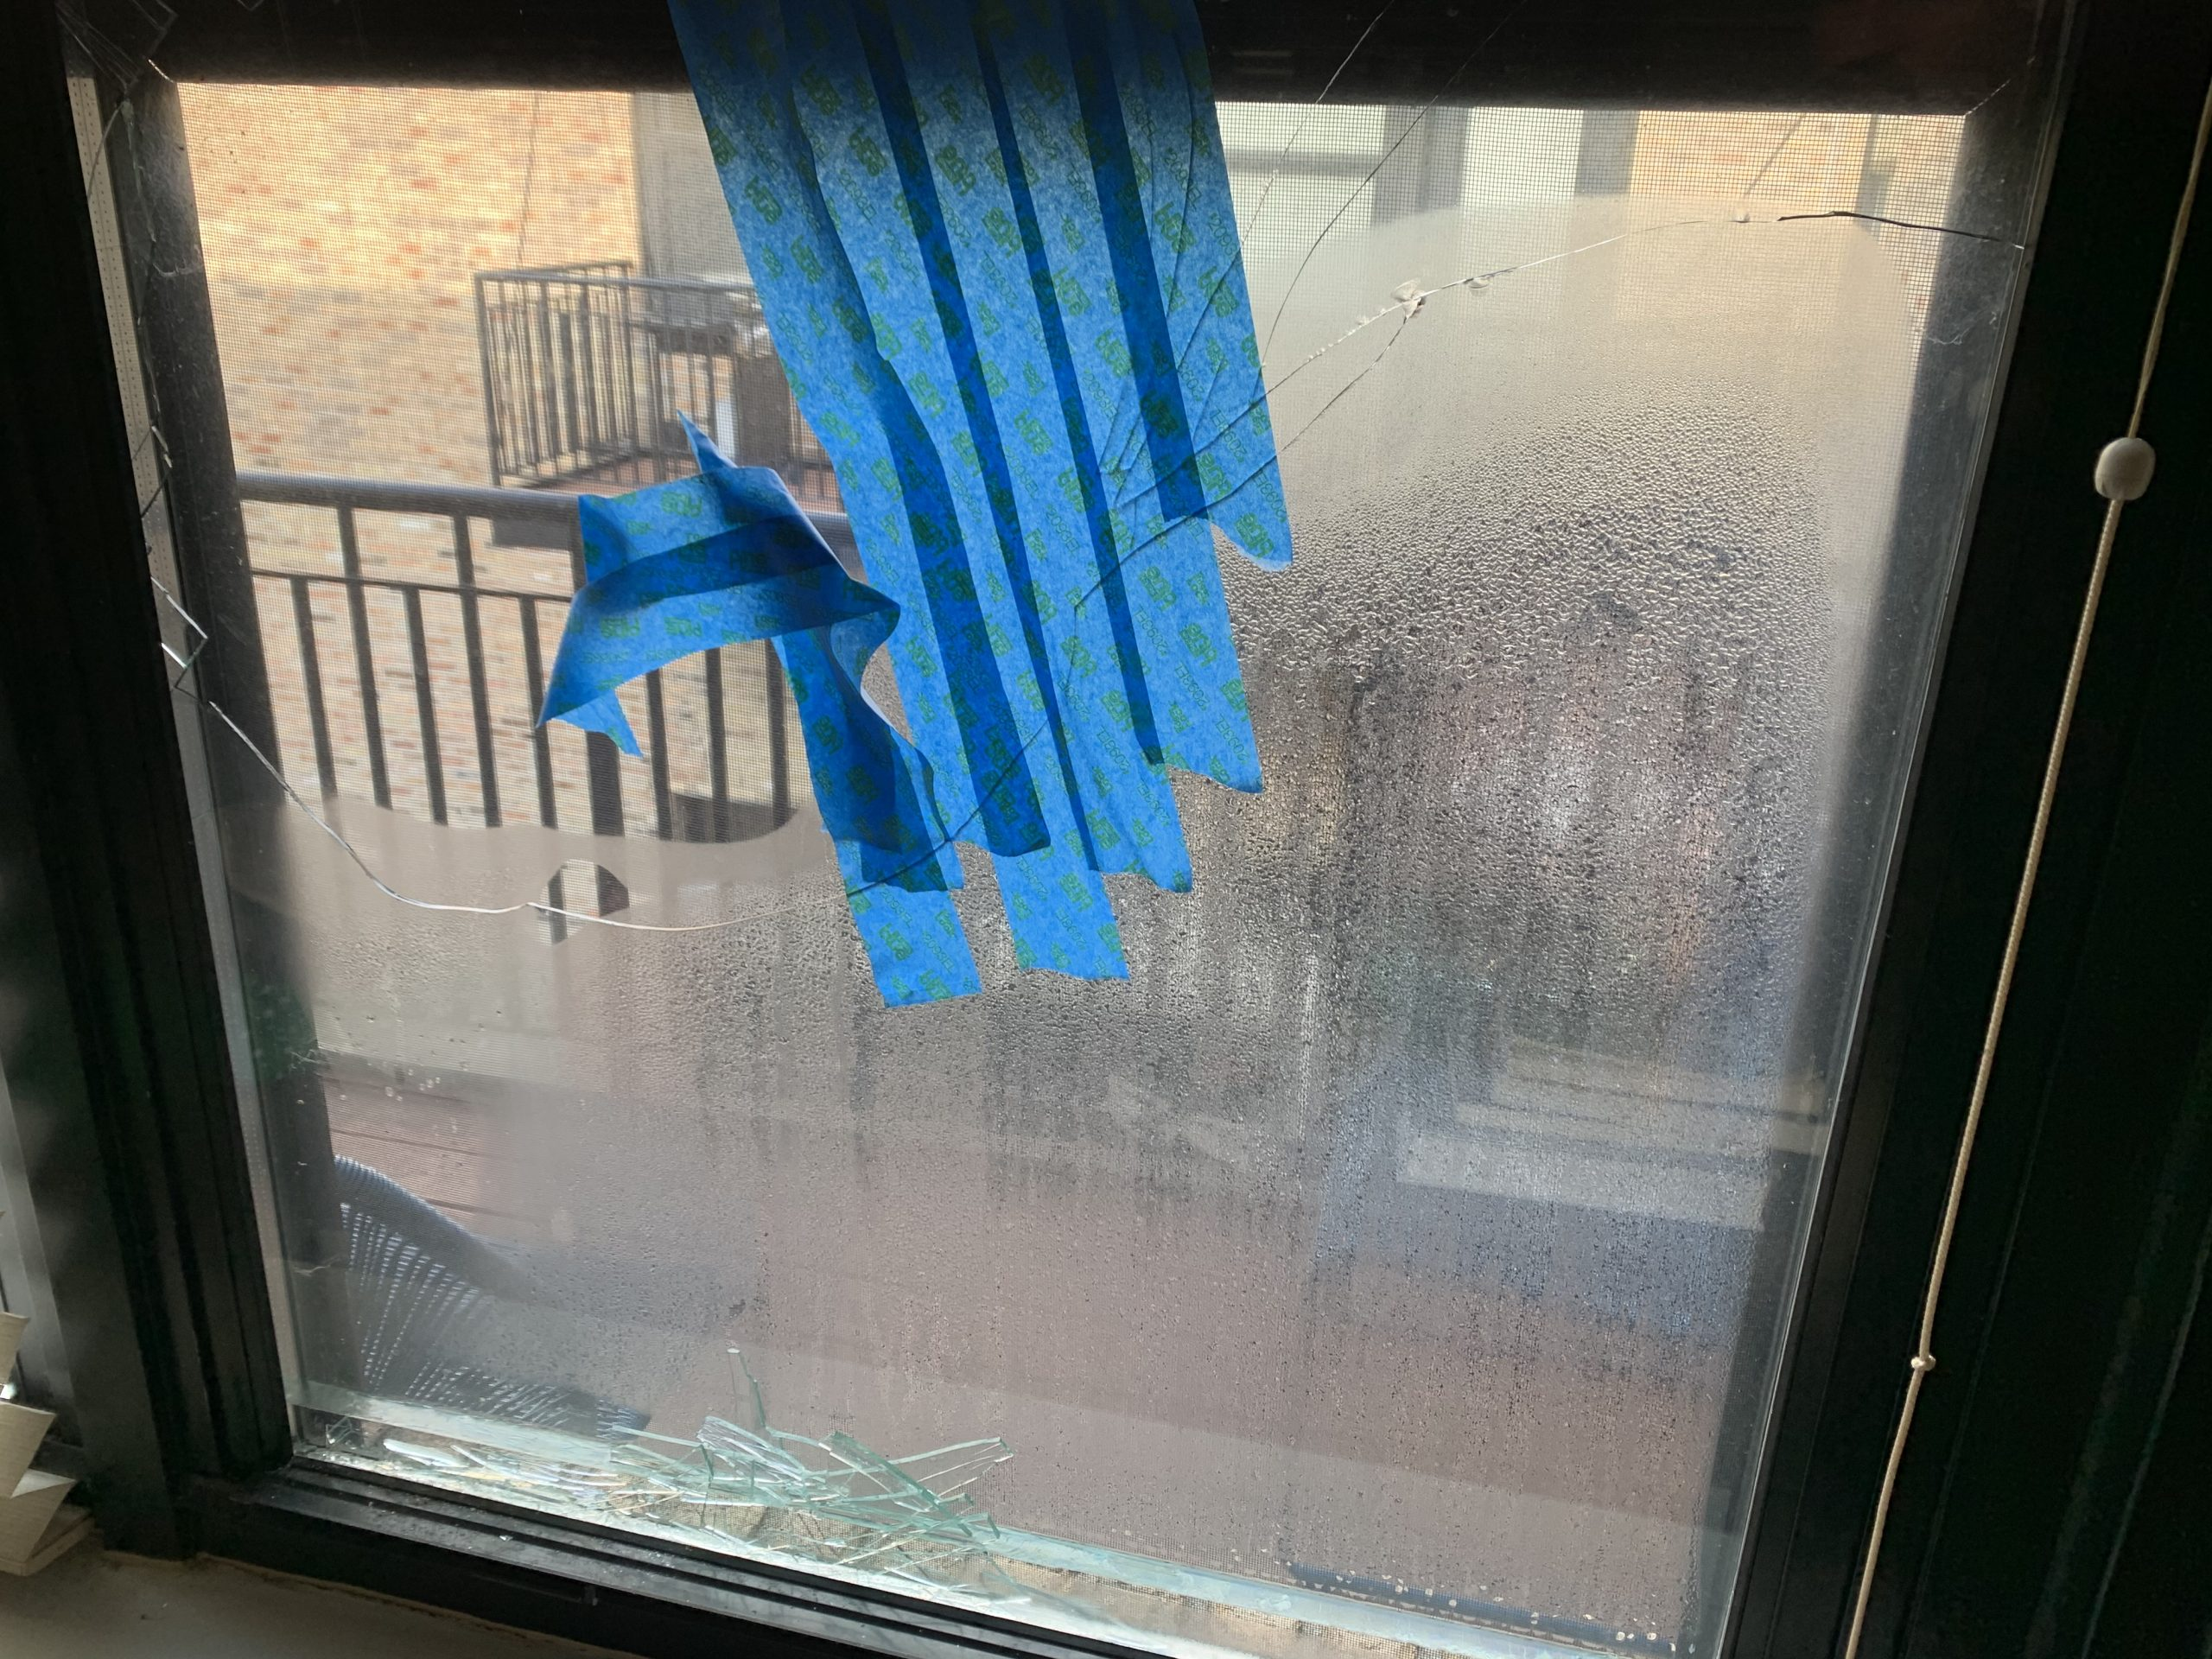 chicago window repair service